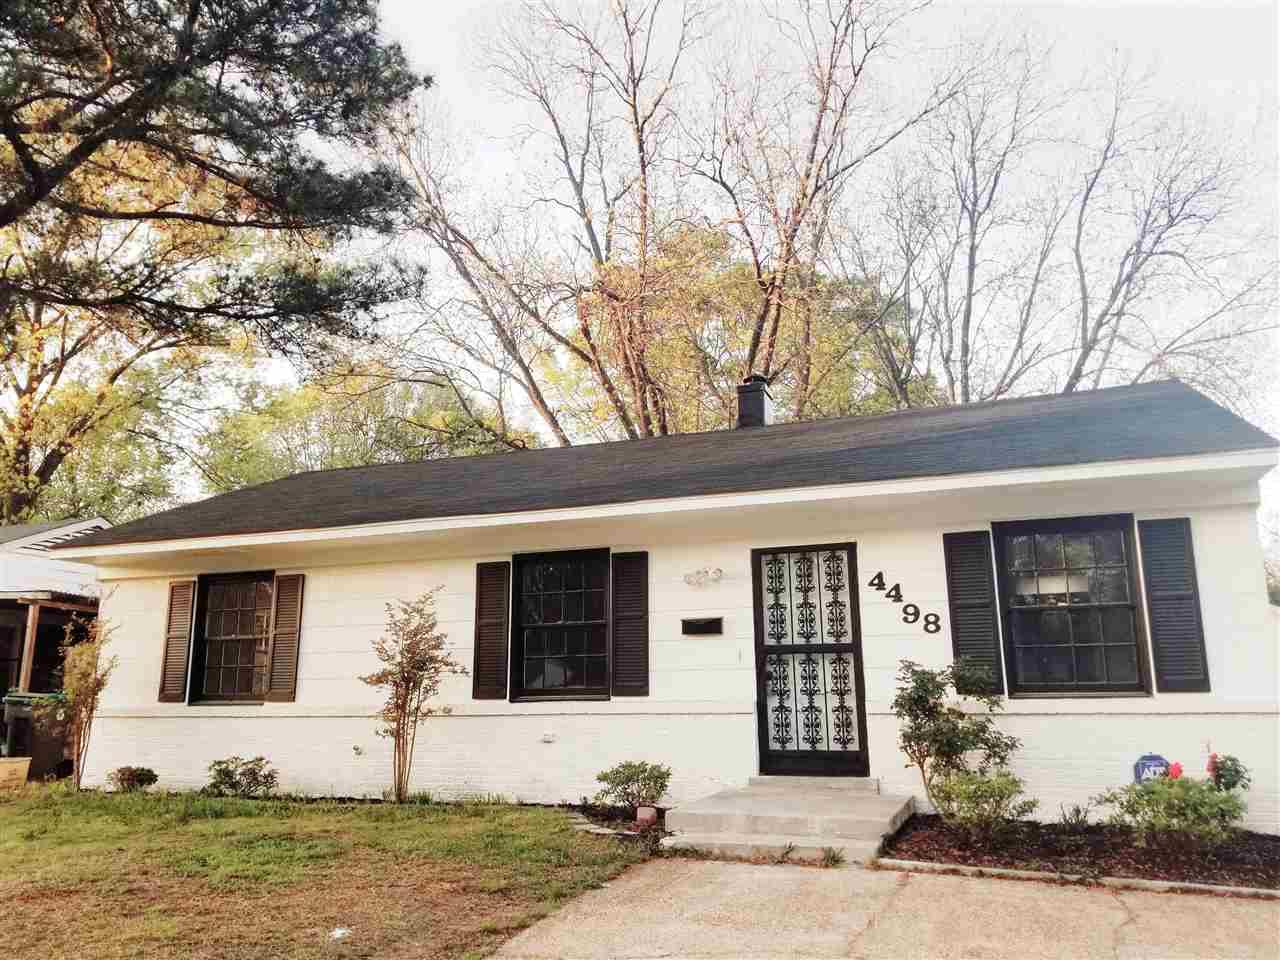 4498 Quince, Memphis, TN 38117